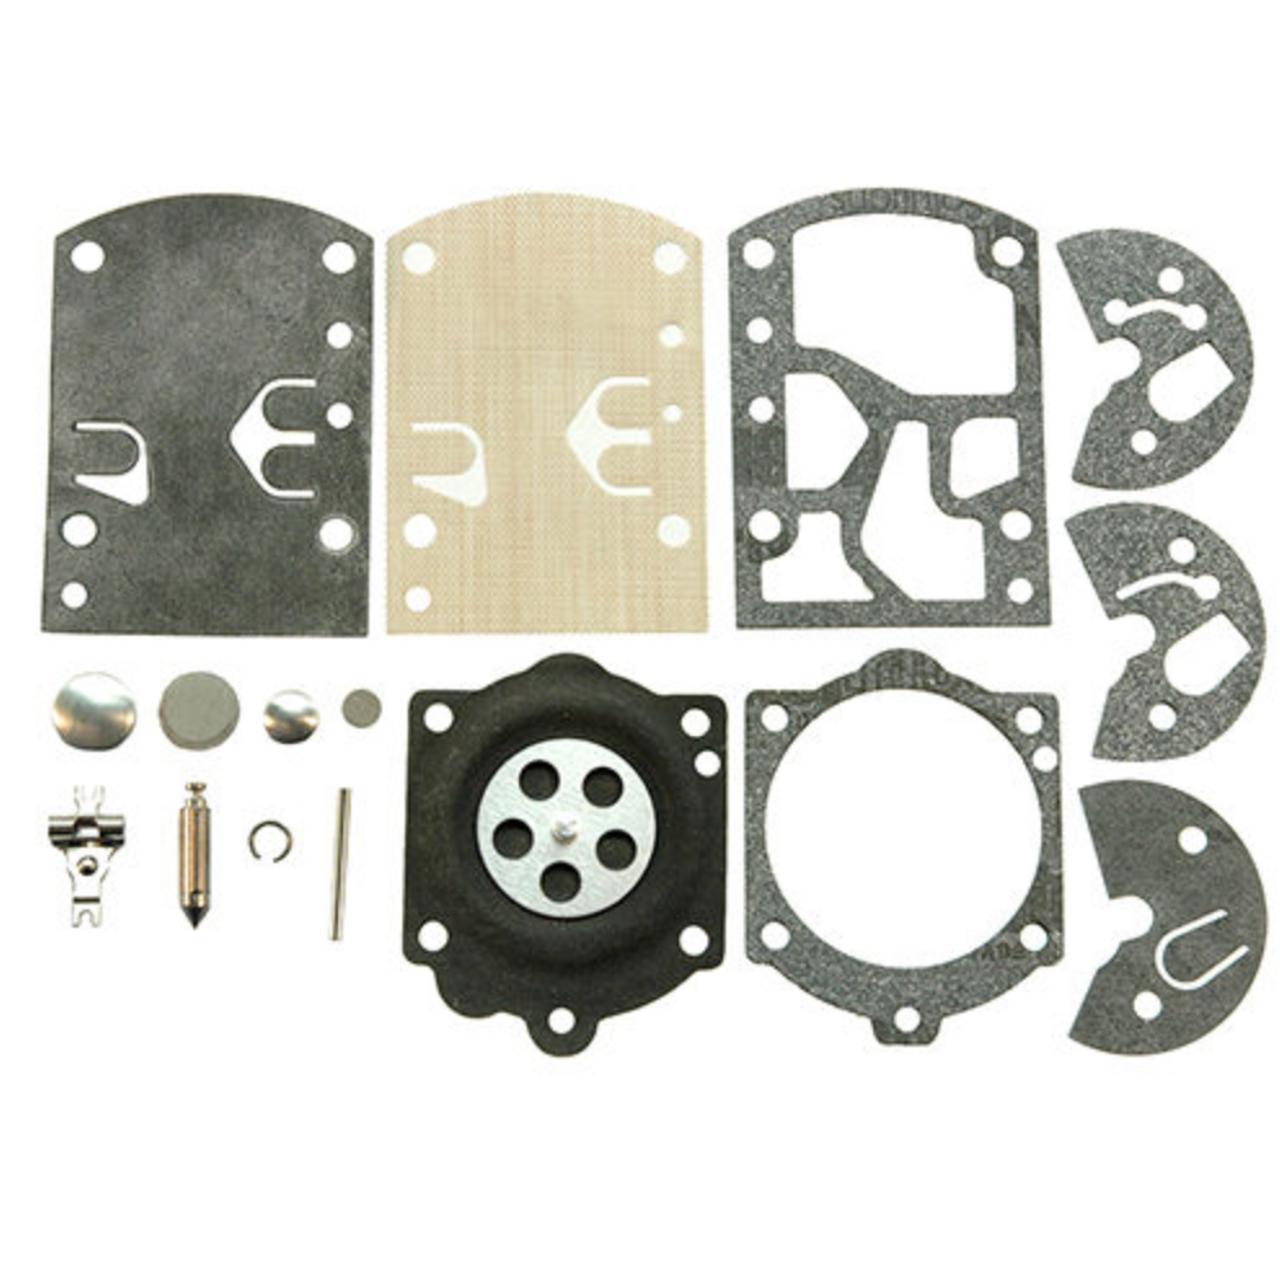 M097 Walboro Carb Kit / Vittorazi Moster 185